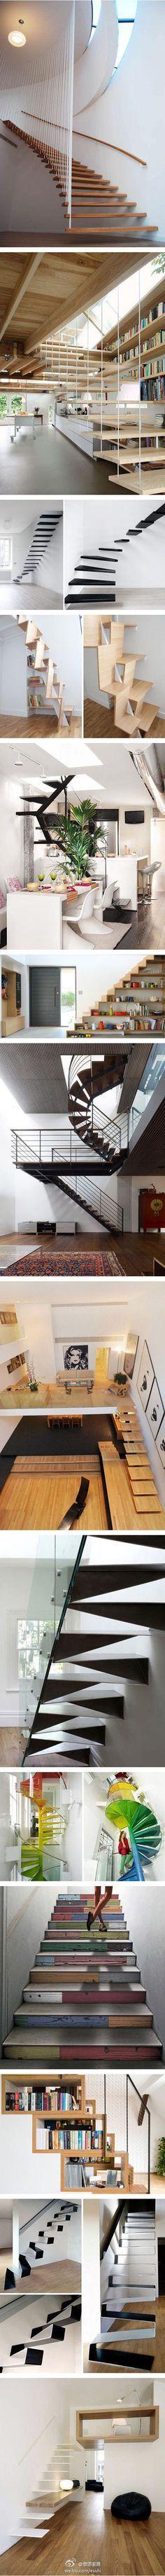 Stairs Treppen wallpaper